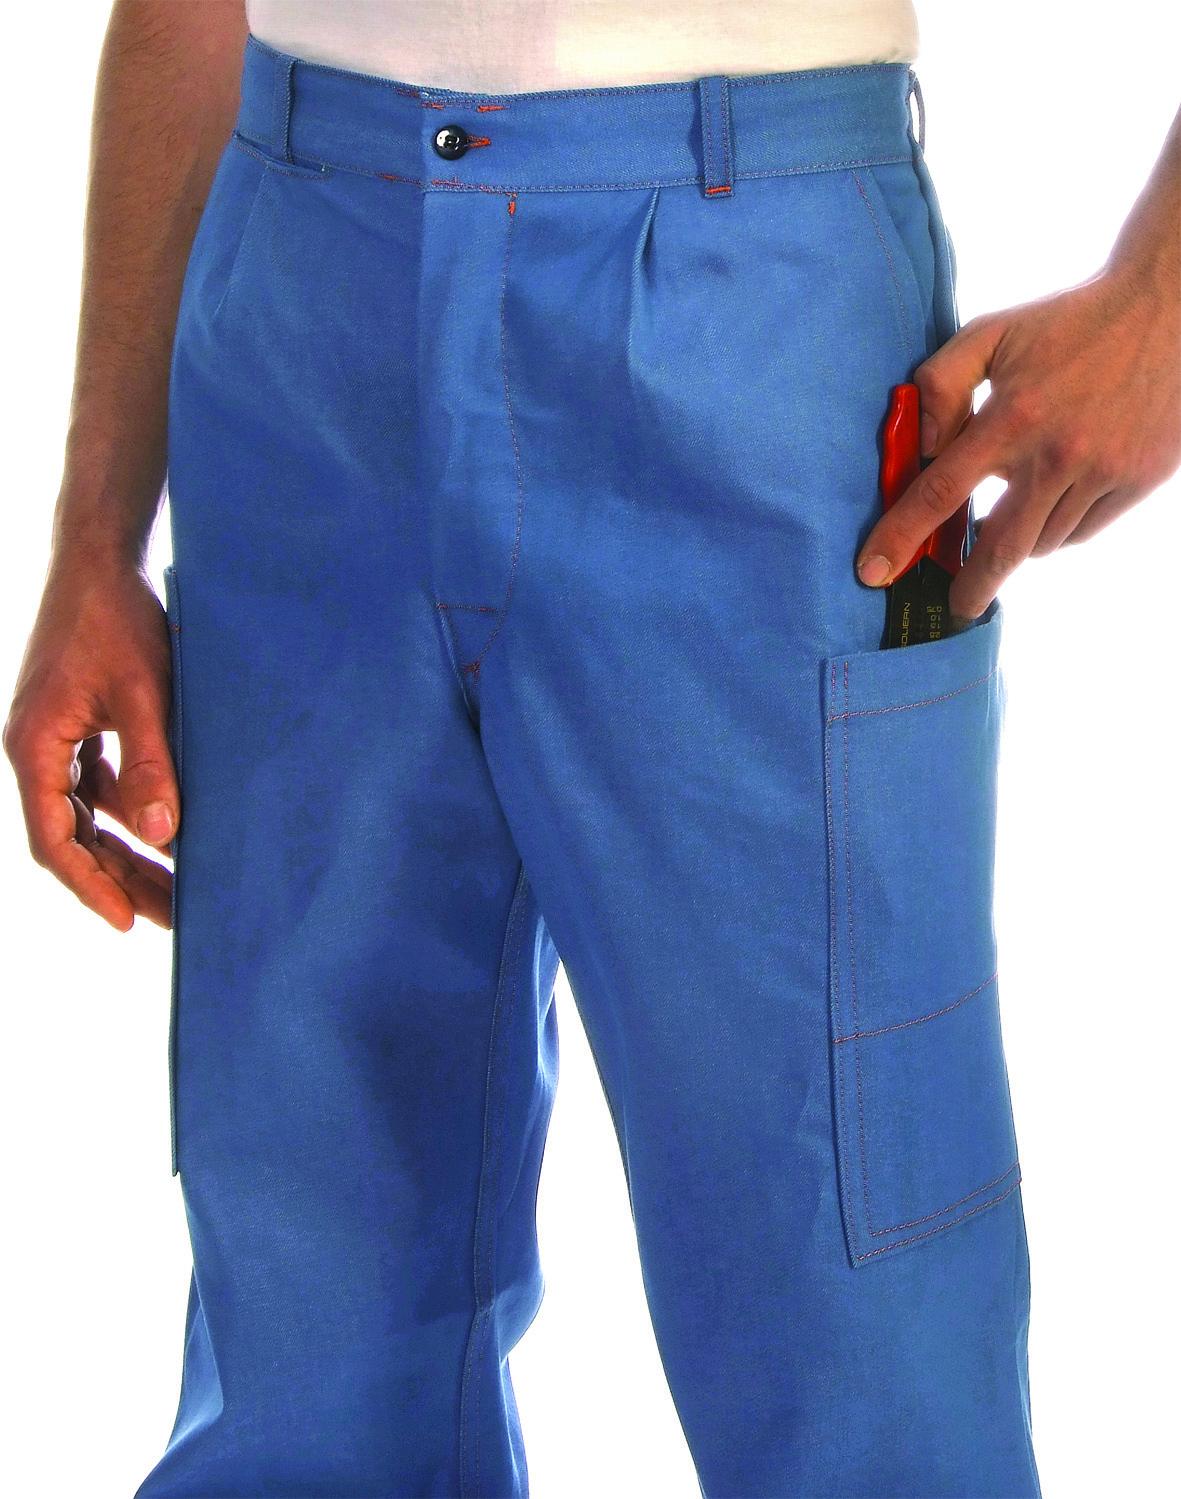 Denim trouser iberd pockets Image